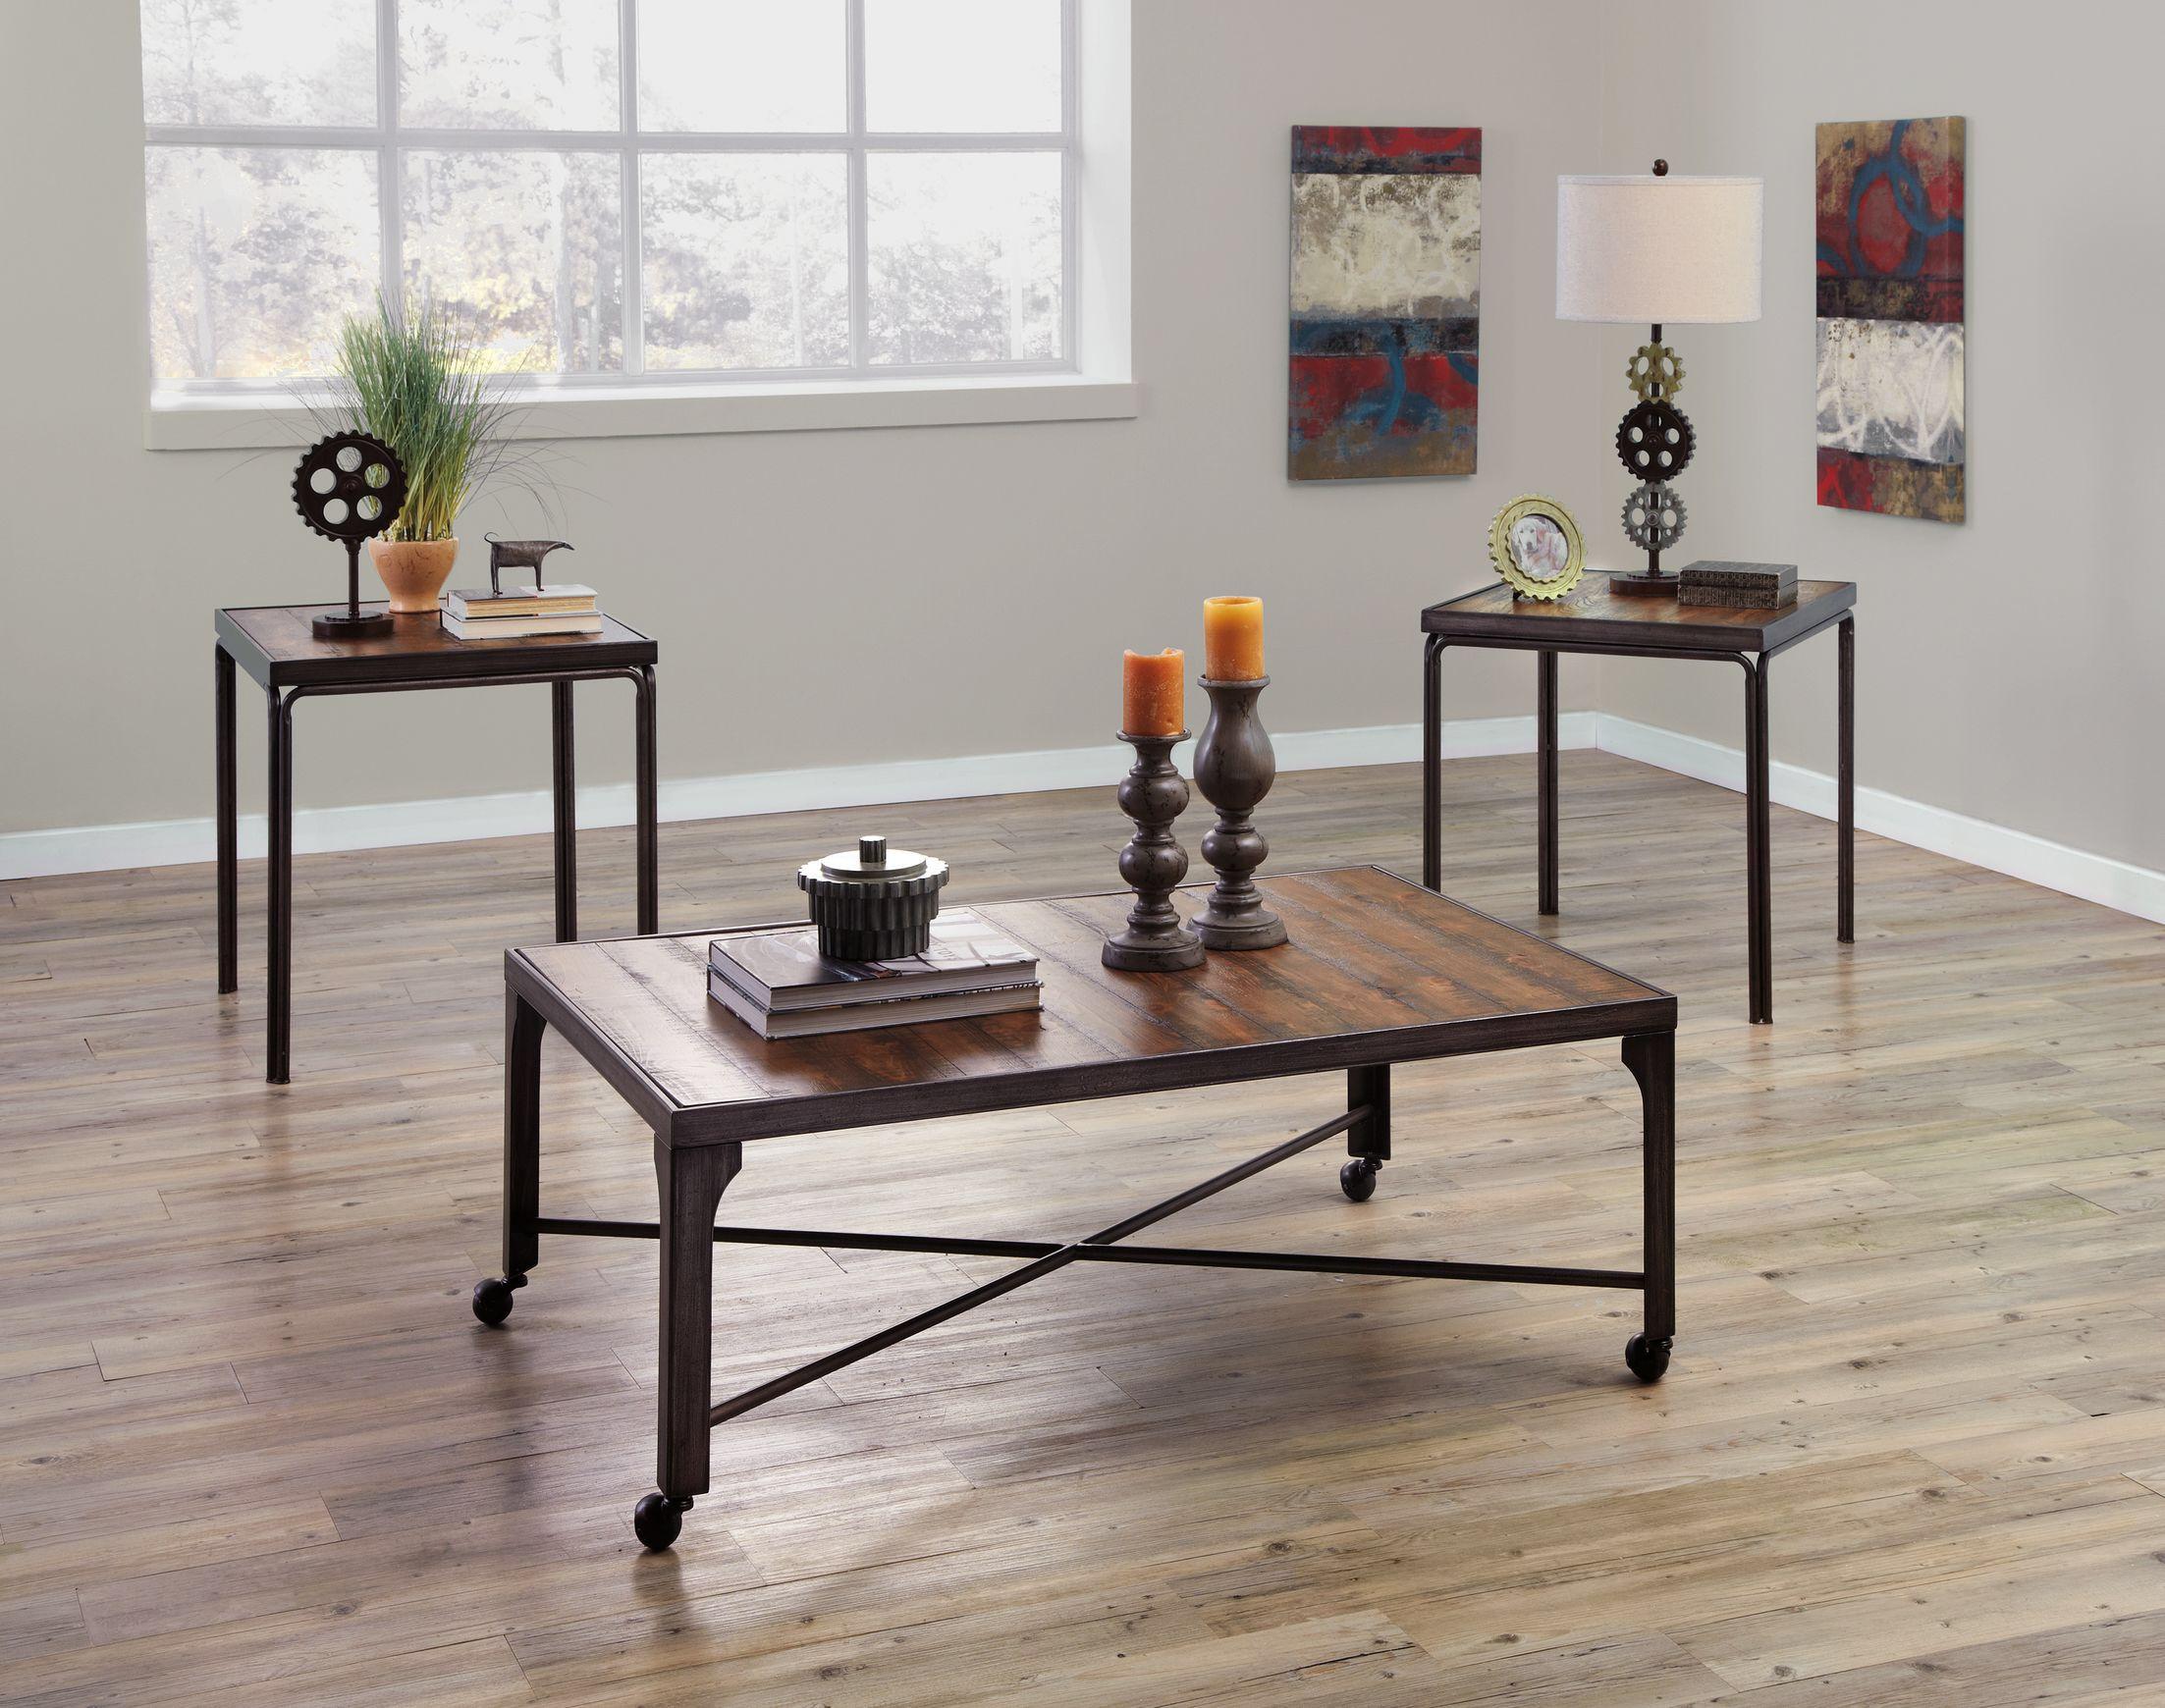 Urbanology 3 Peice Coffee Table Set Furniture Ideas